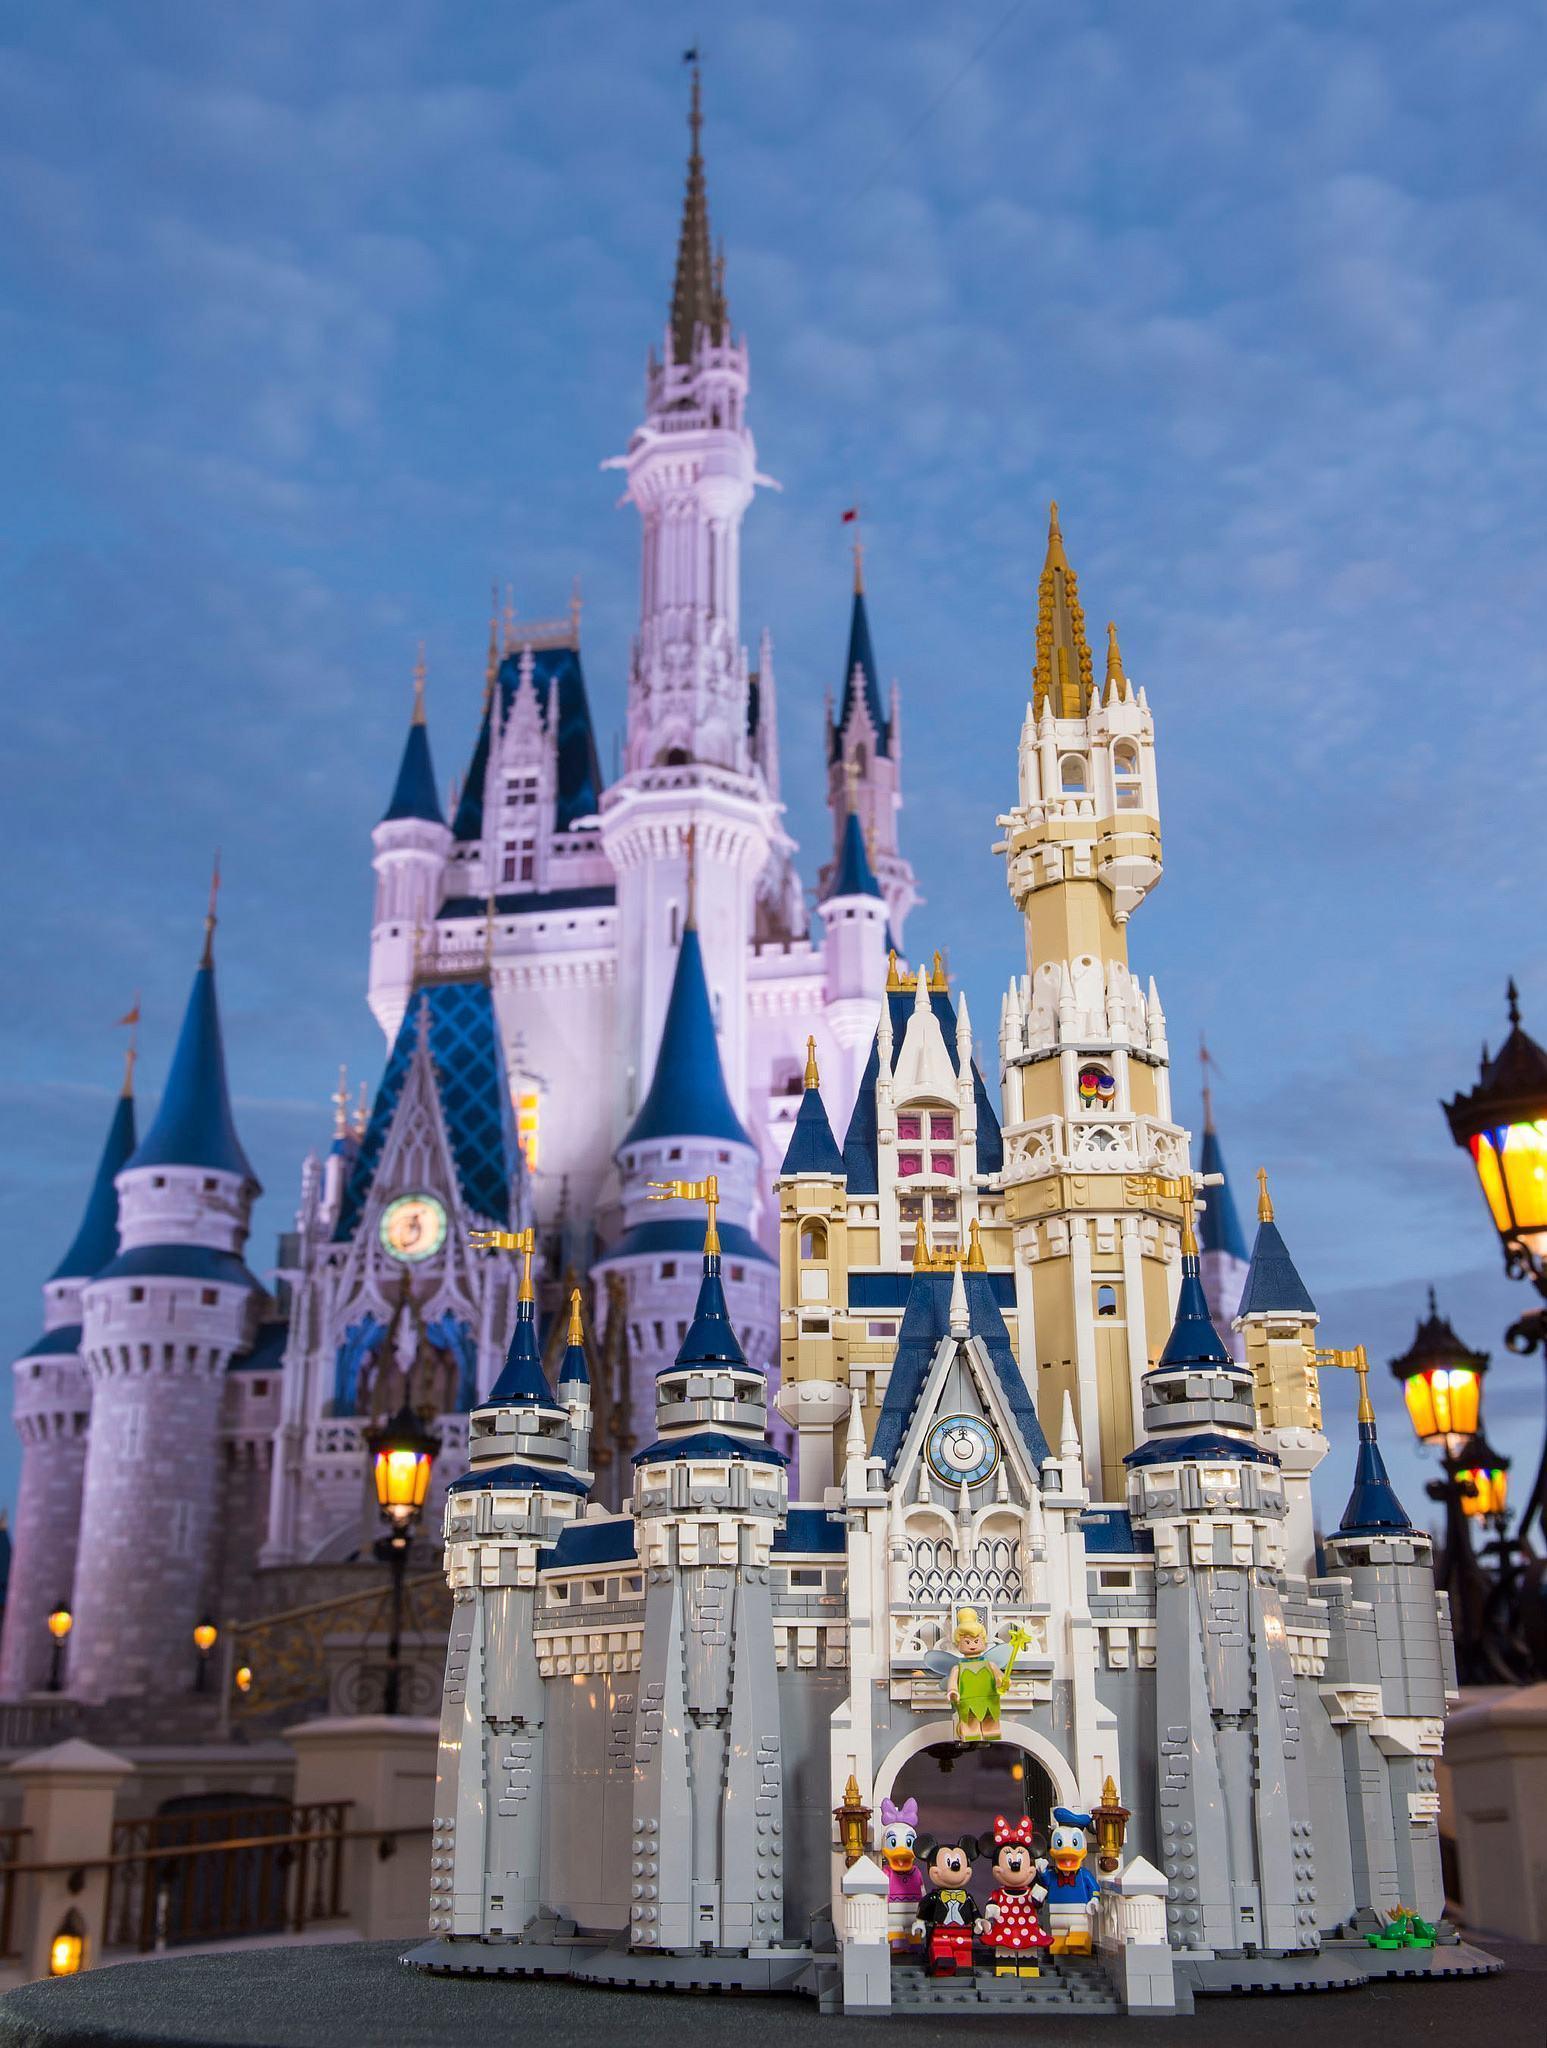 LEGO-The-Disney-Castle-Cinderella-19